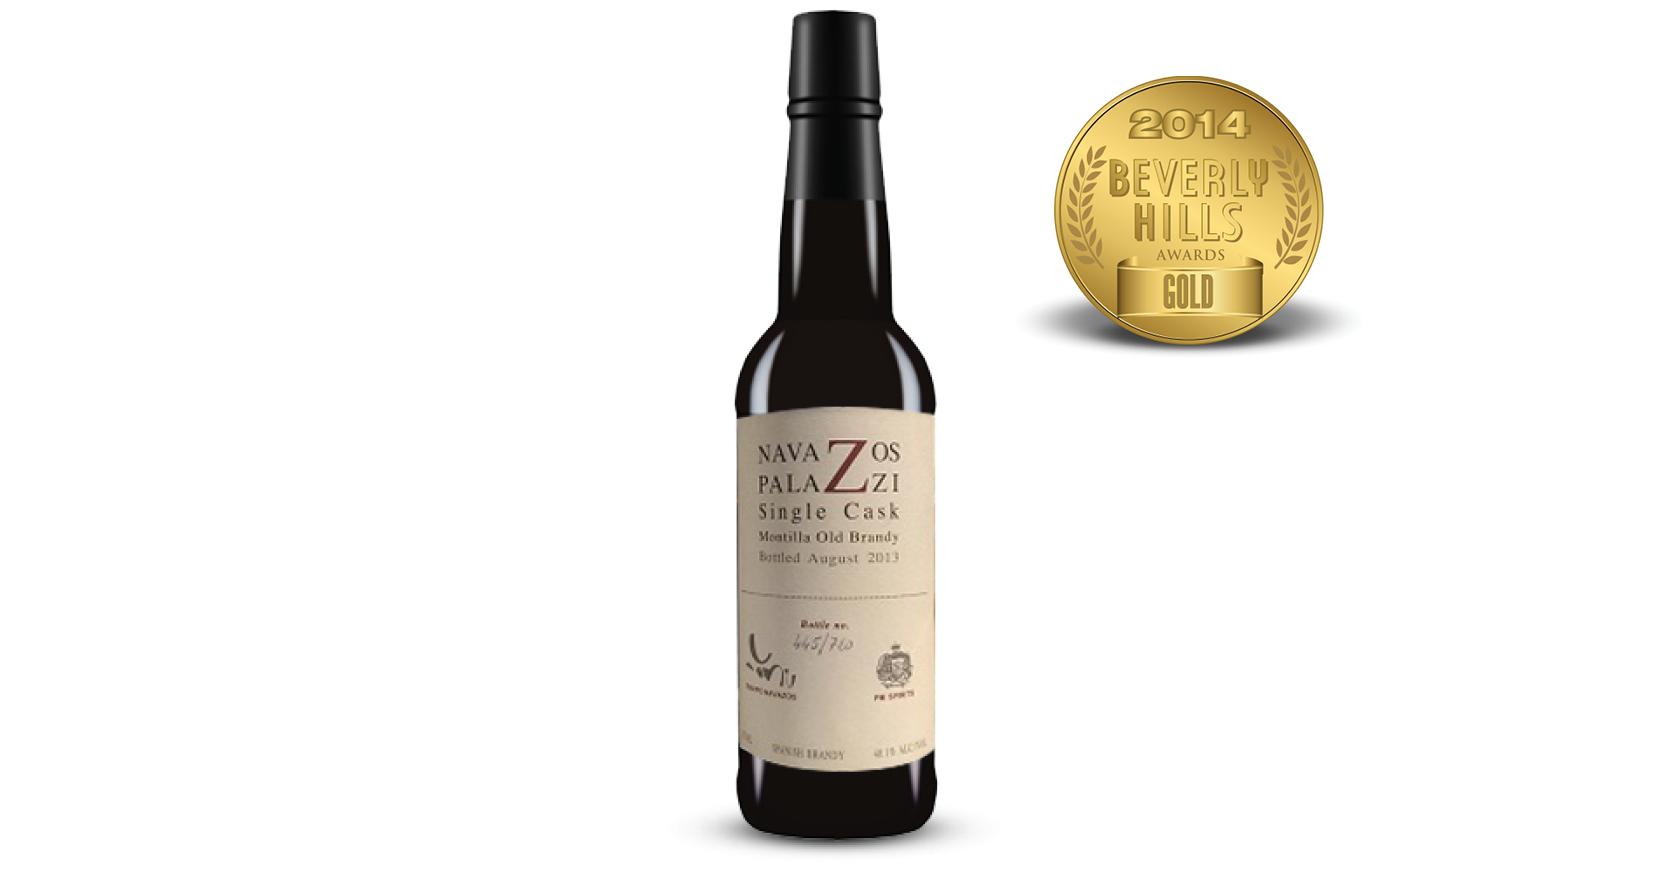 Navazos-Palazzi Jerez Brandy-Release #3 Old Montilla Single Cask